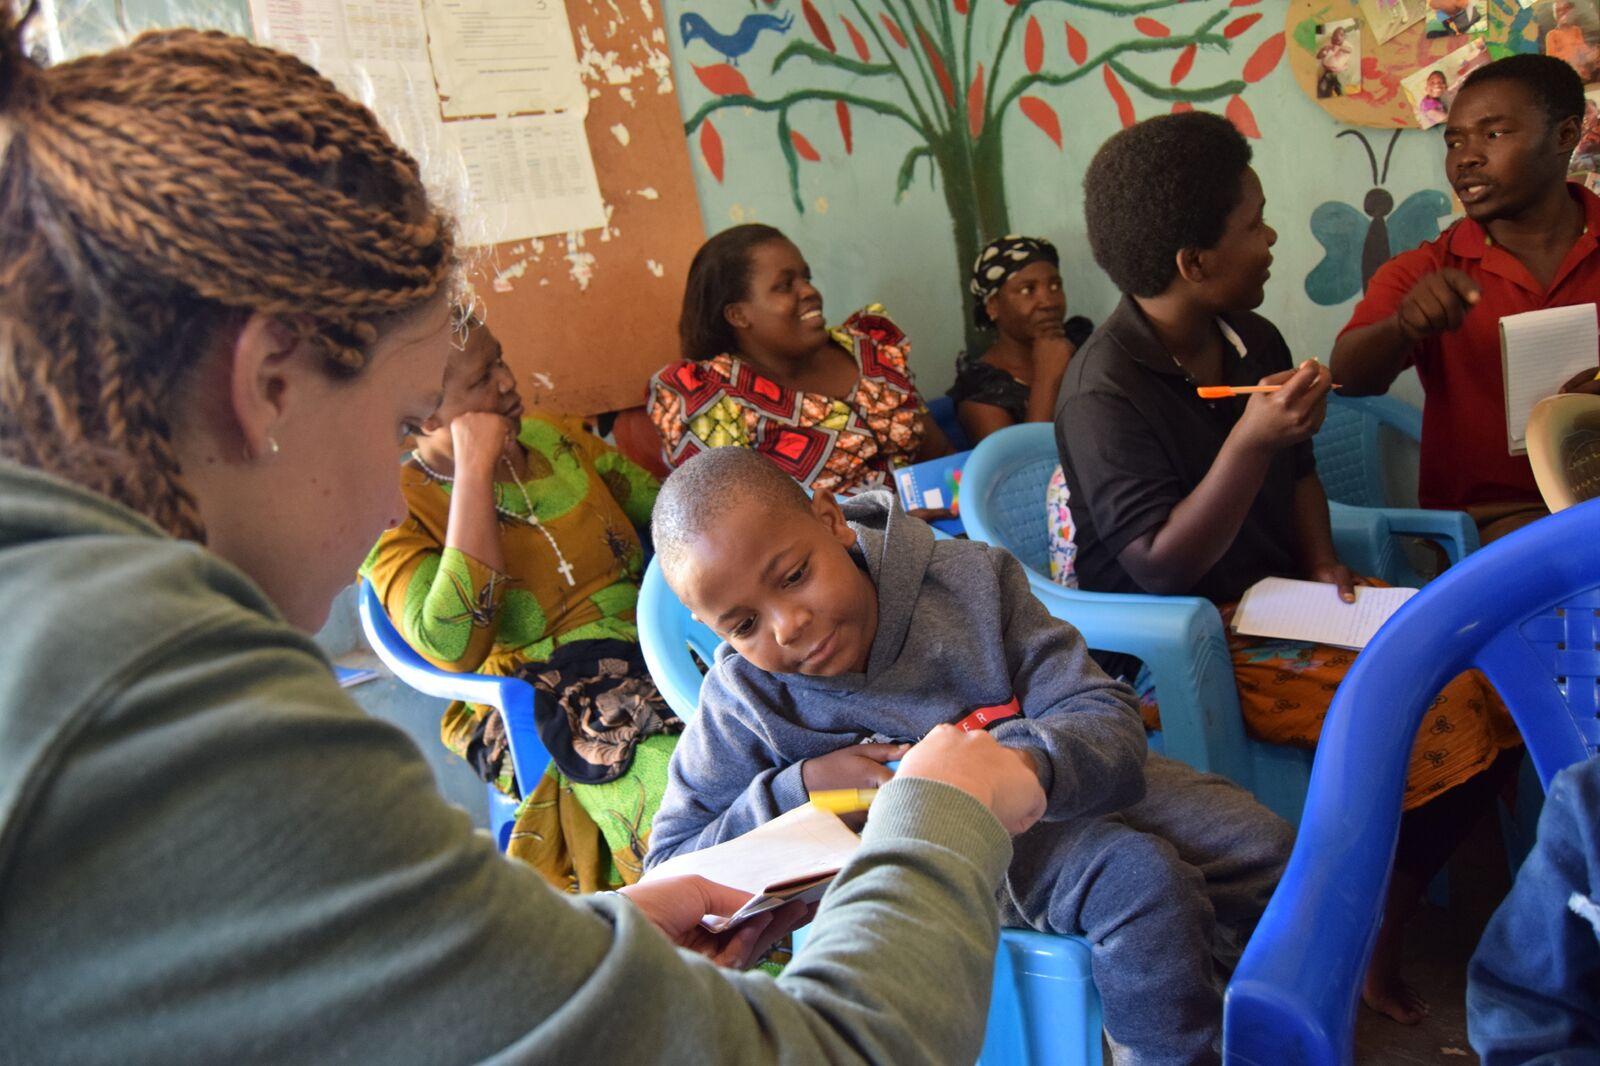 Simama CBR - Tanzania, Caritas Pro Vitae Gradu Charitable Trust, Ariane Slinger